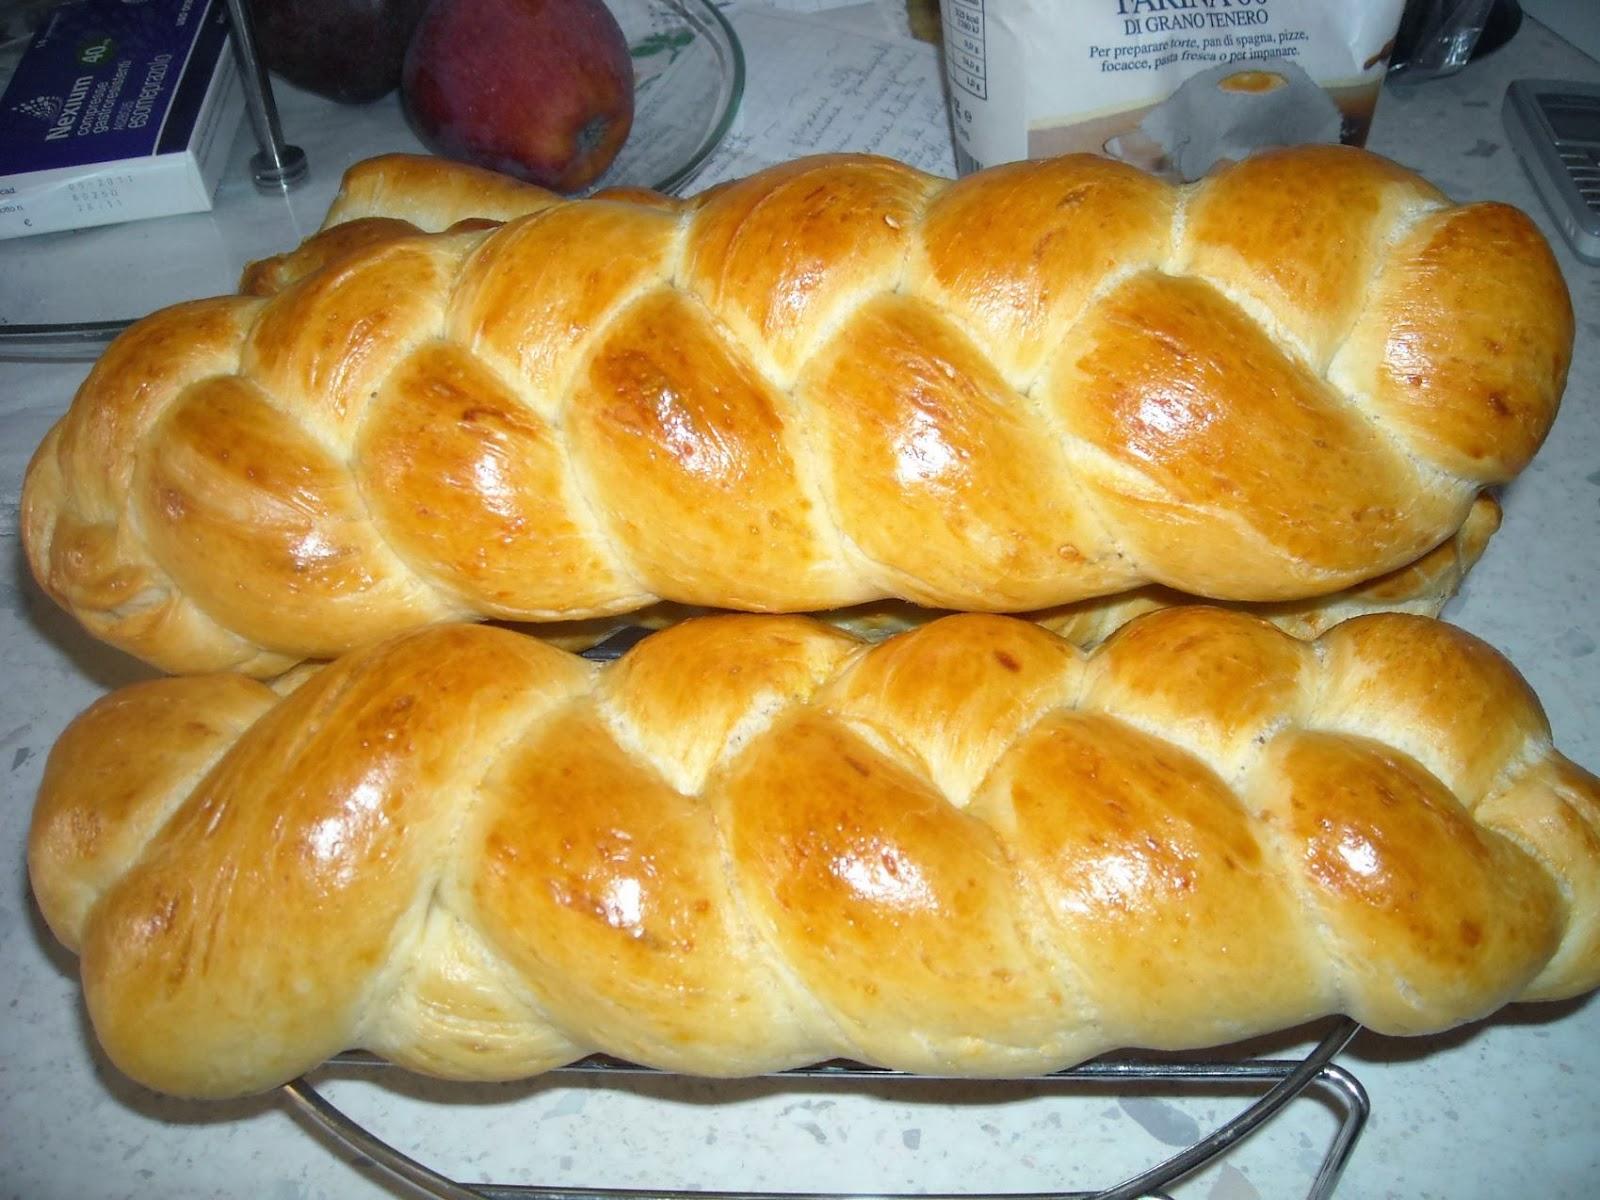 Pin Embelsira-shqiptare-receta-trilece-genuardis-portal on Pinterest